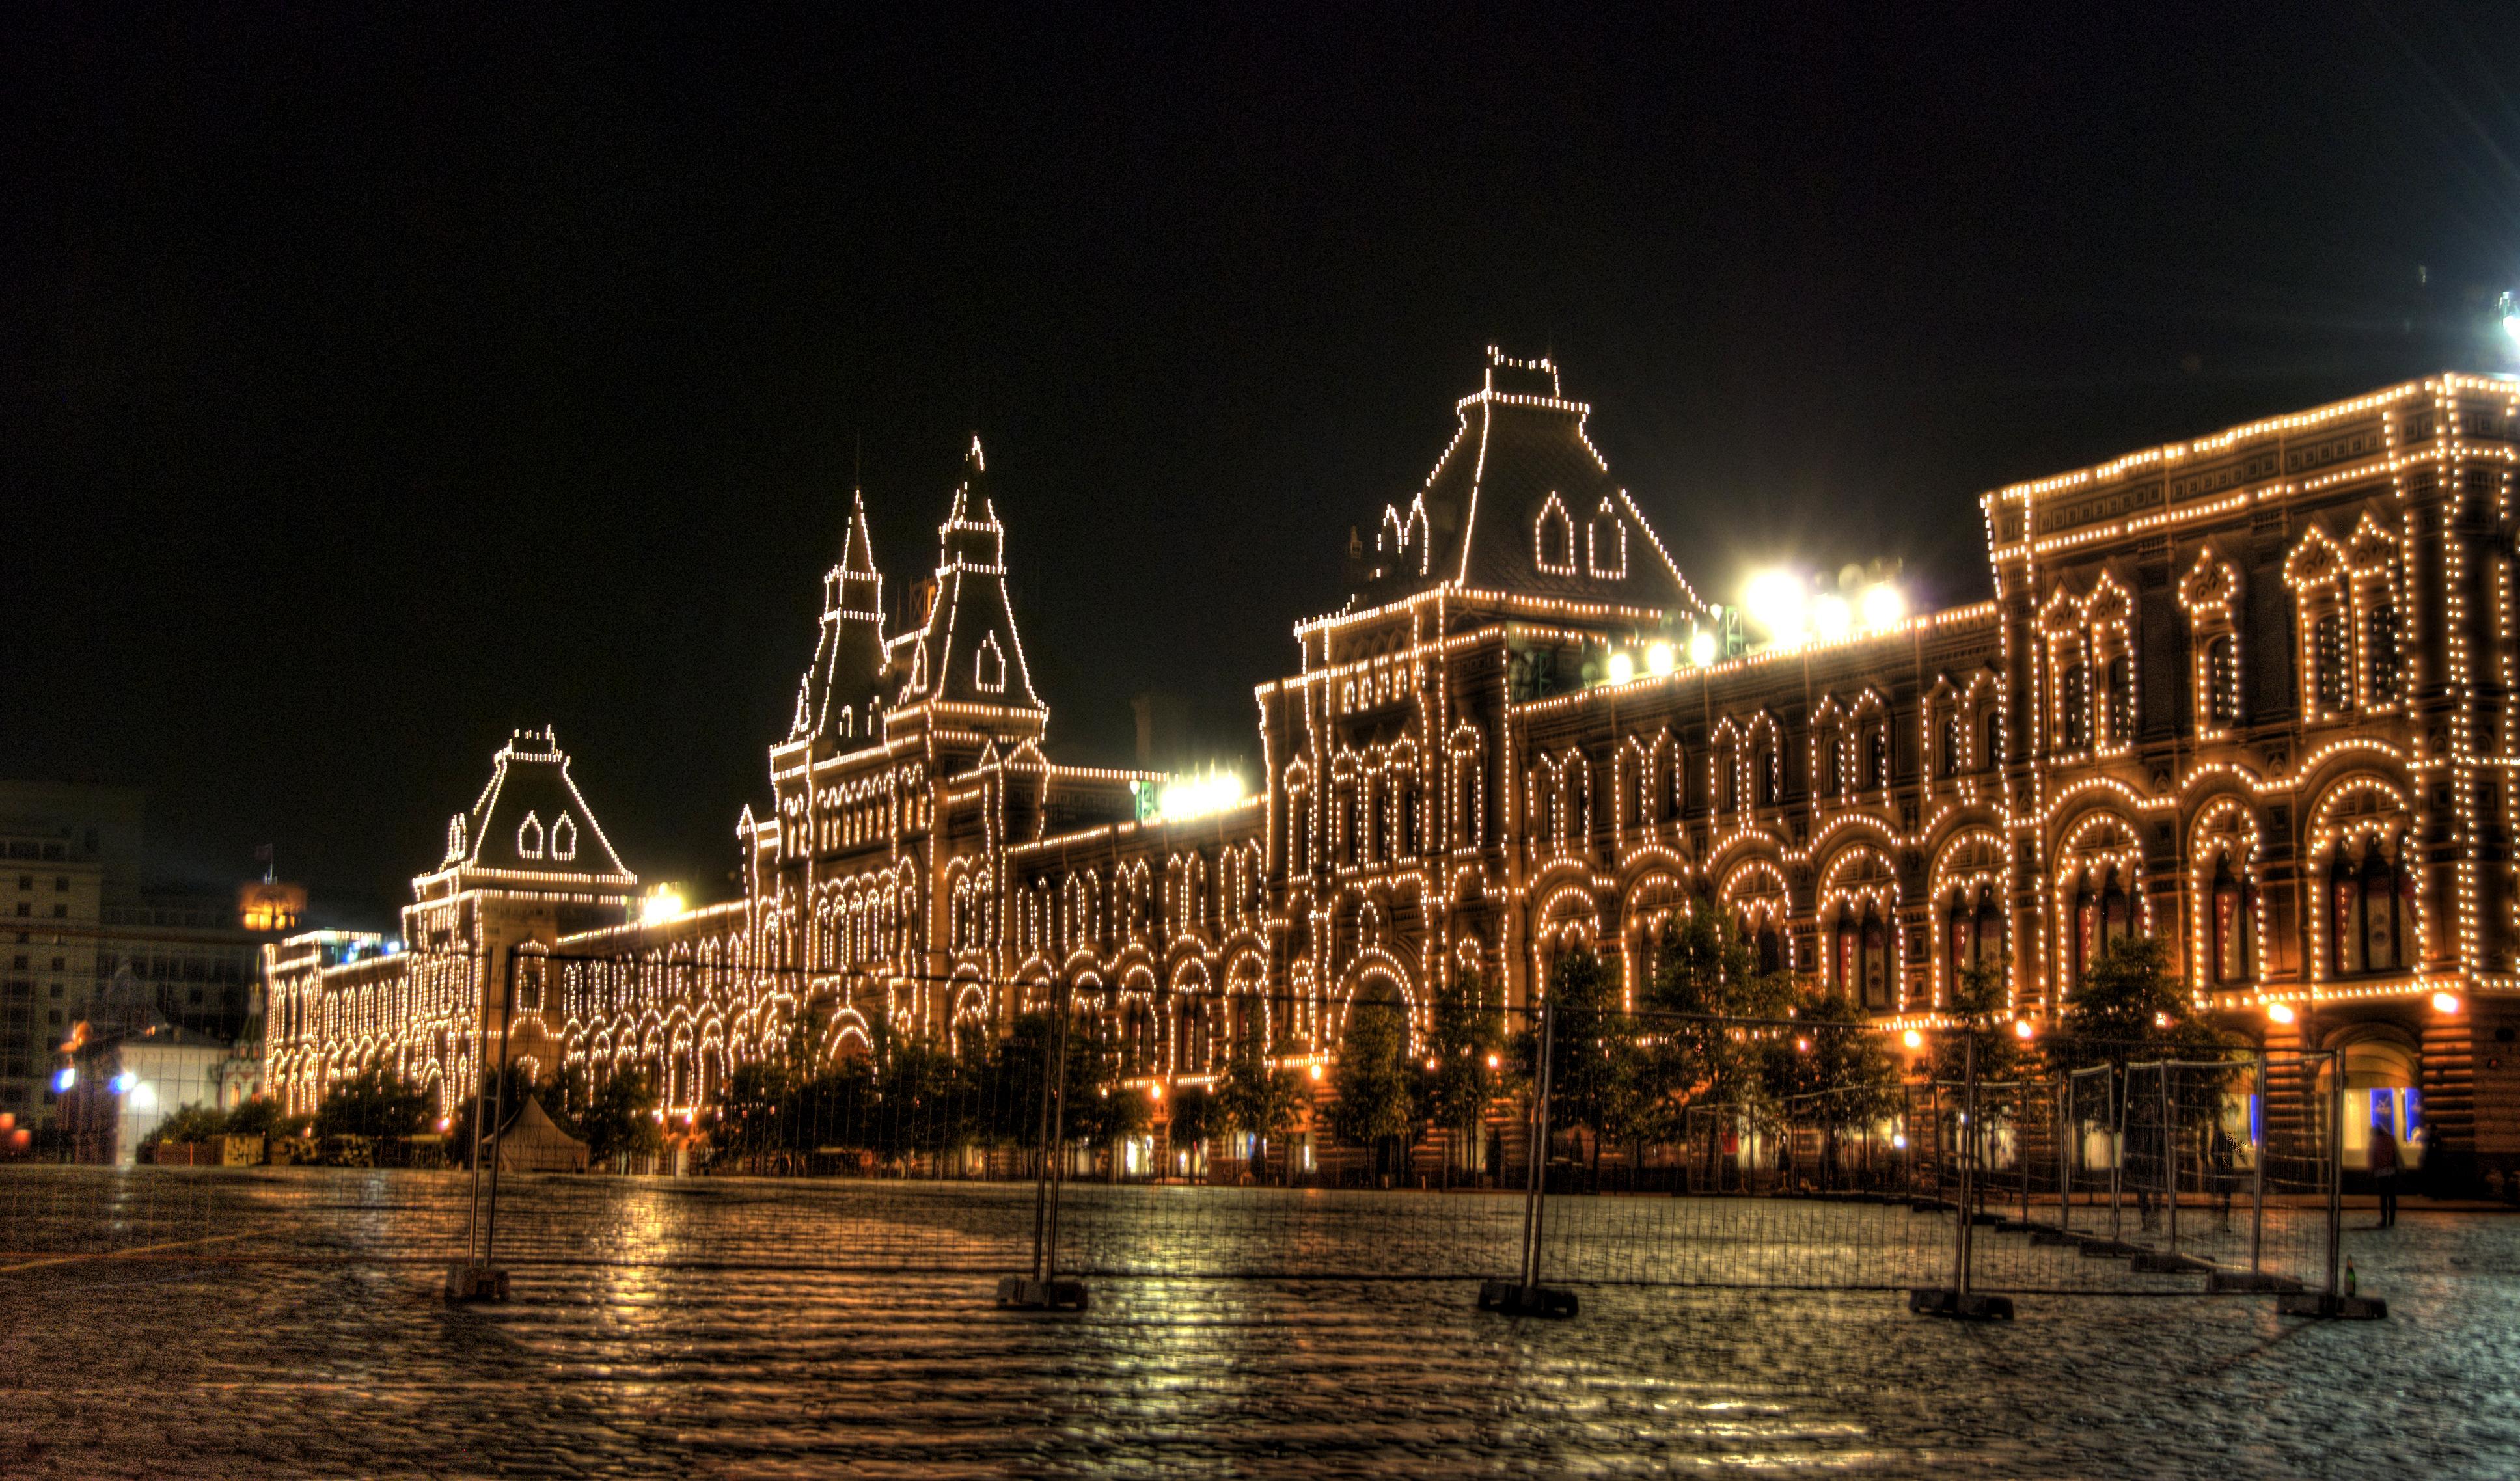 Russia Dan Goodman Photography